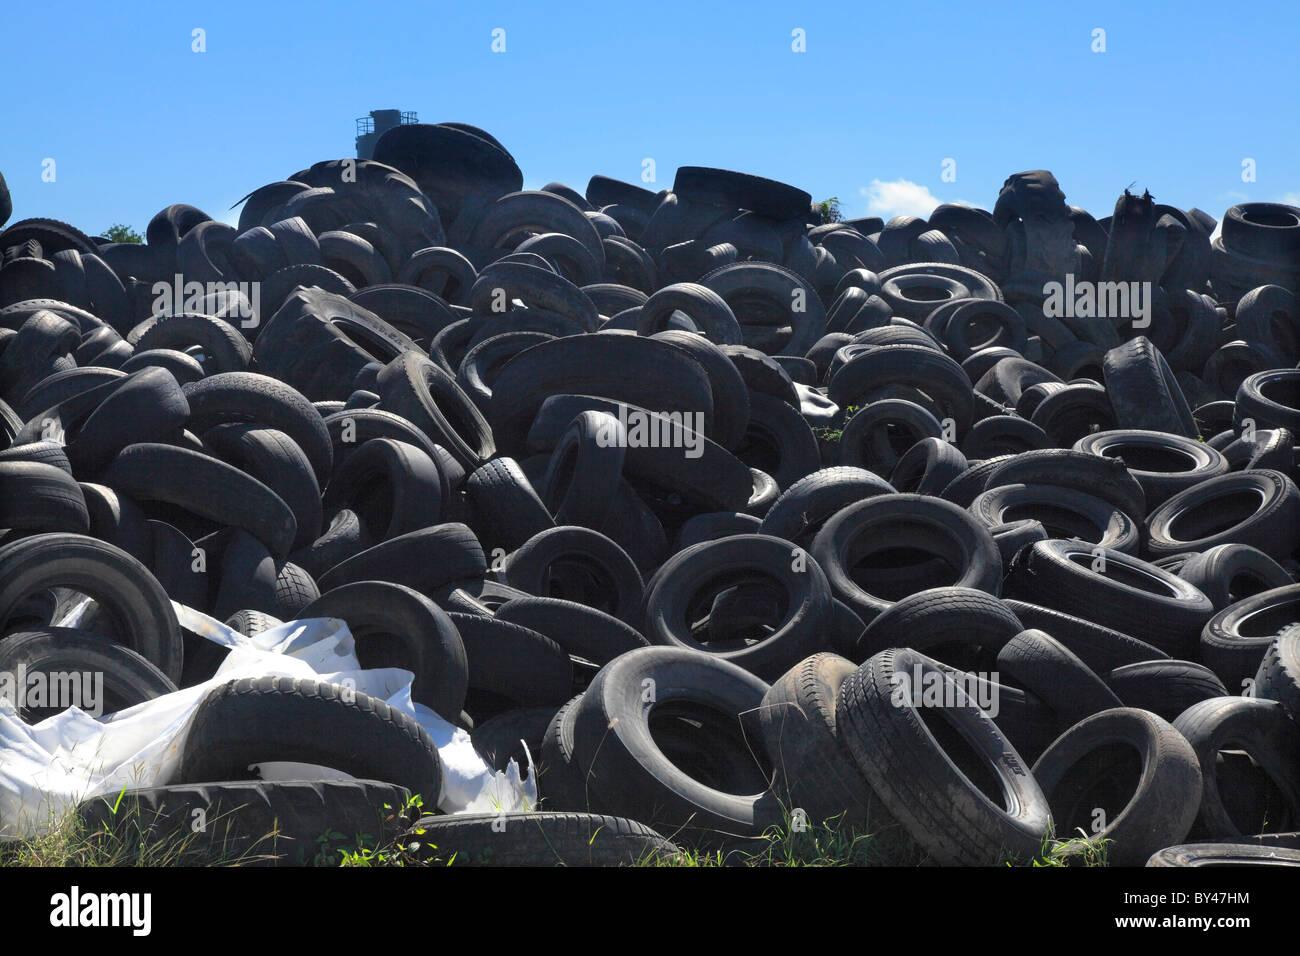 Tyre Dump - Stock Image